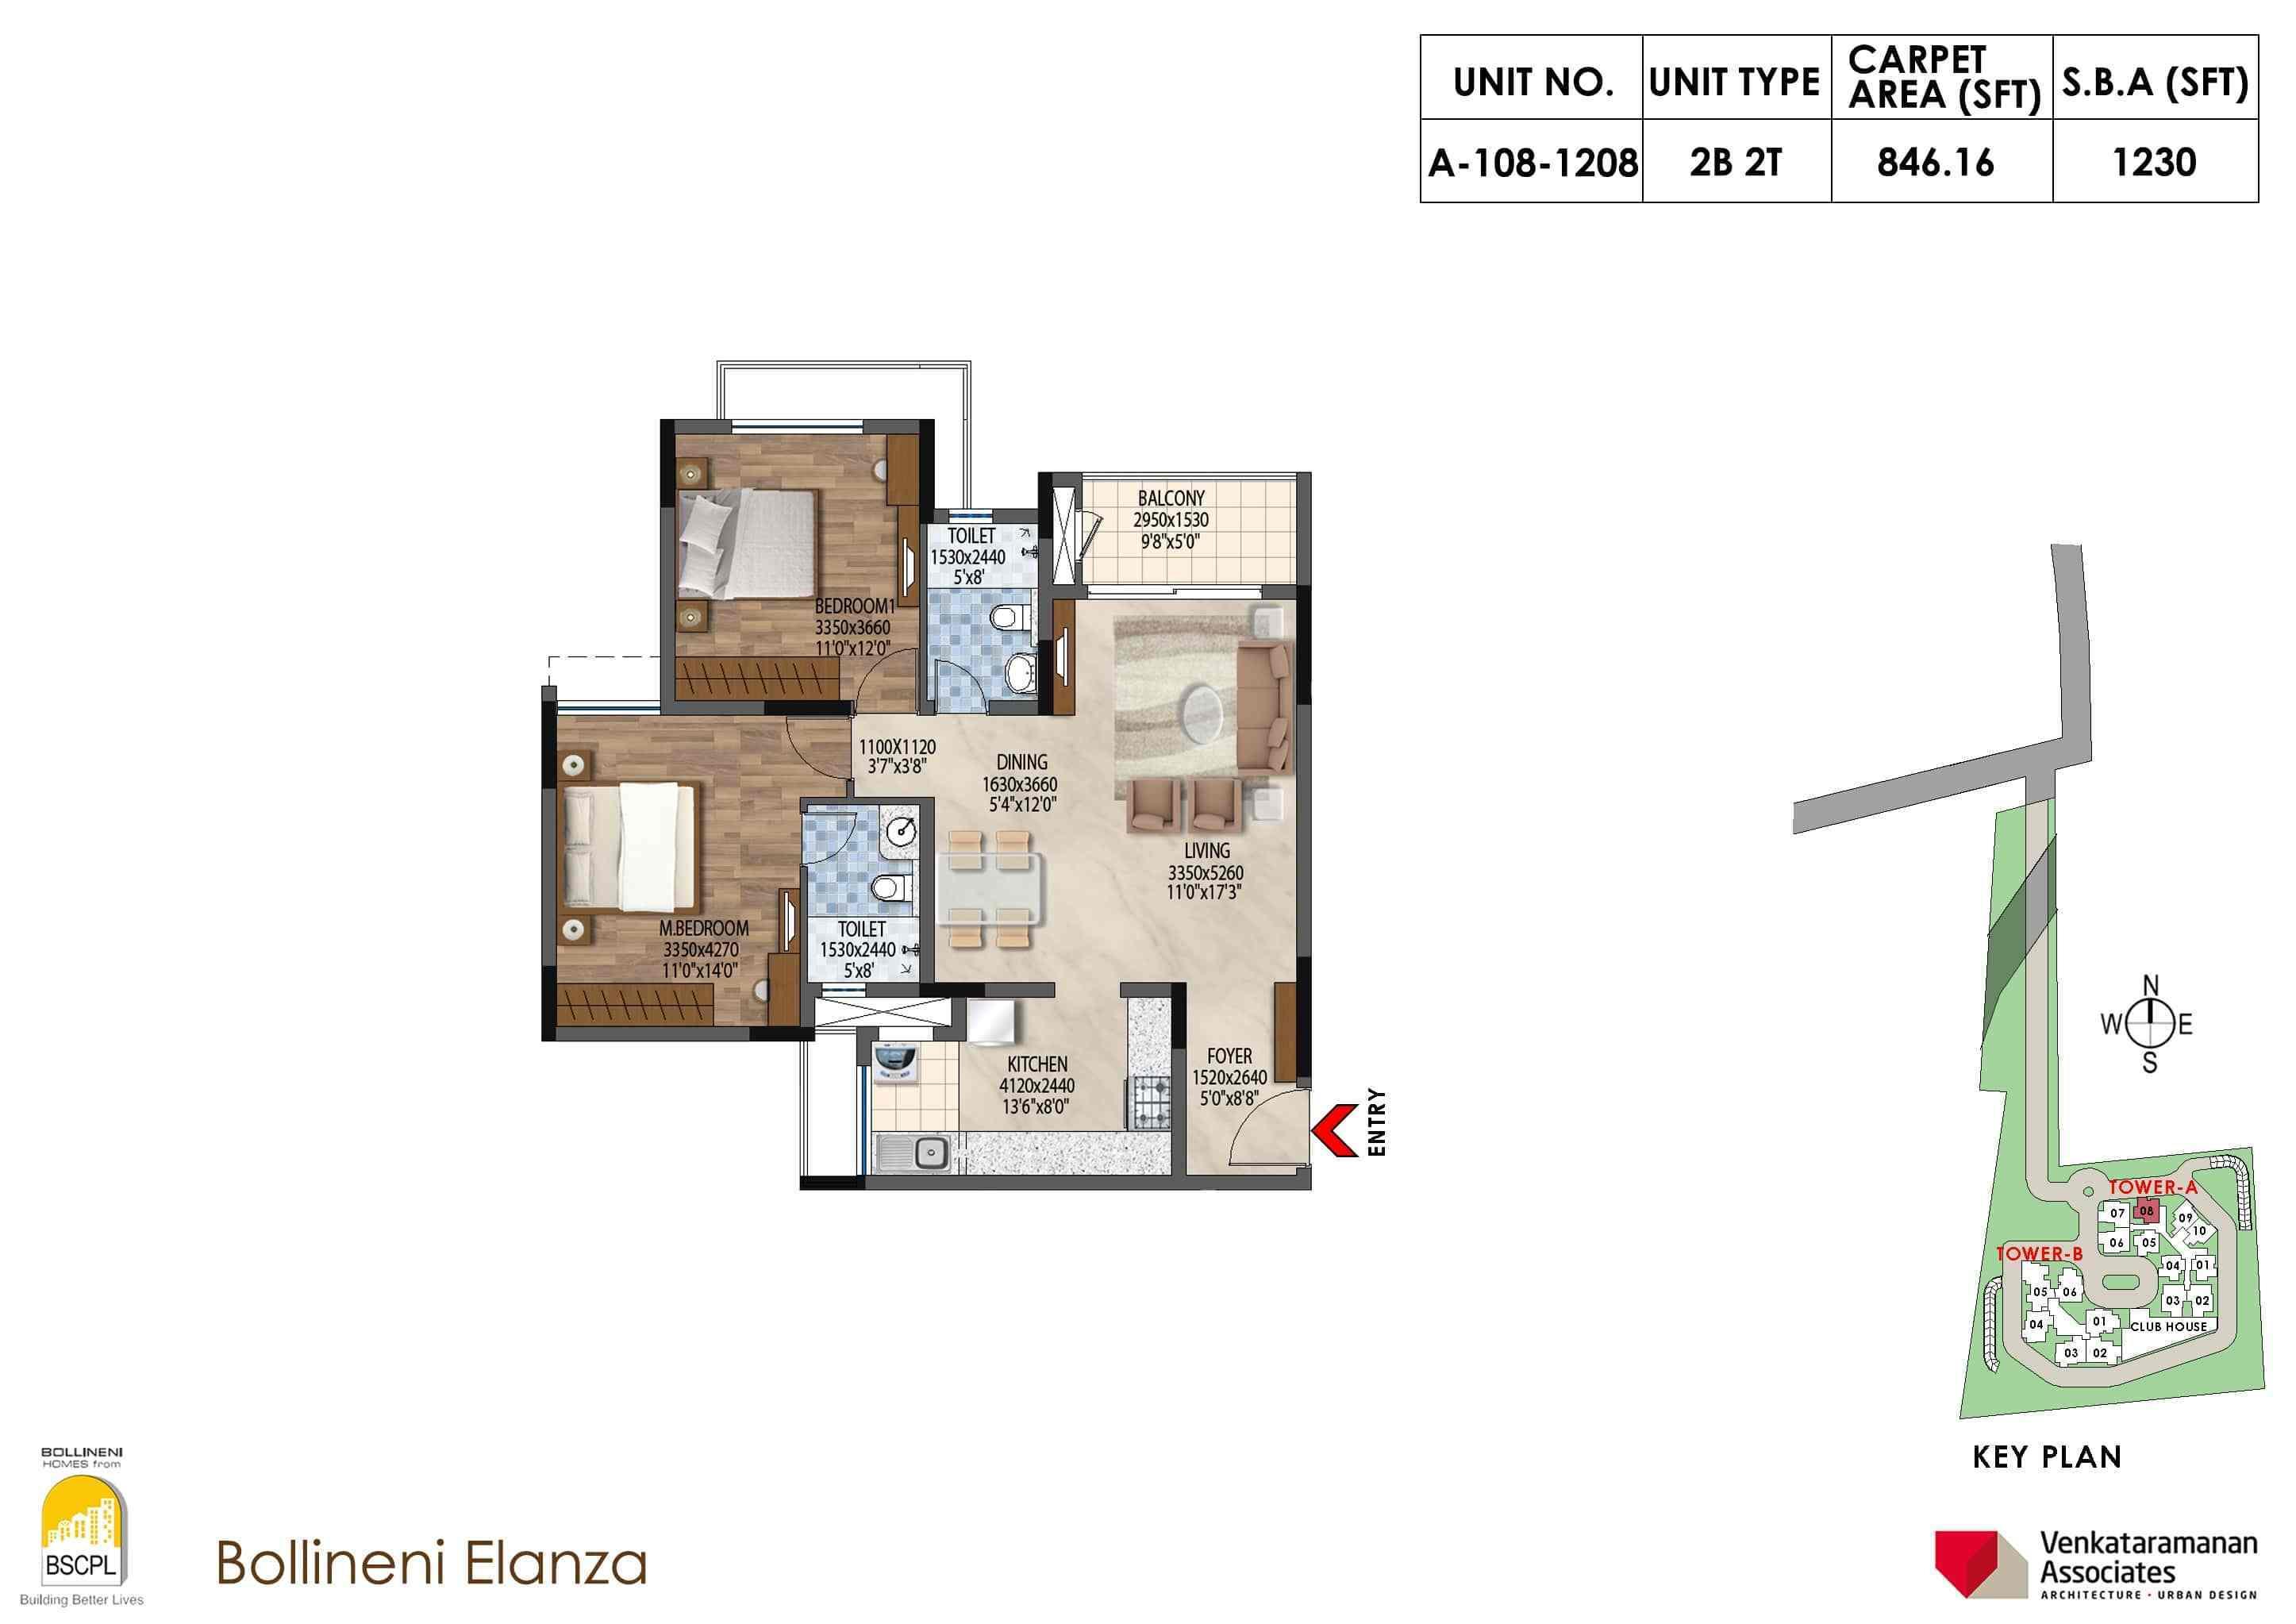 Bollineni Elanza 2 BHK Floorplan